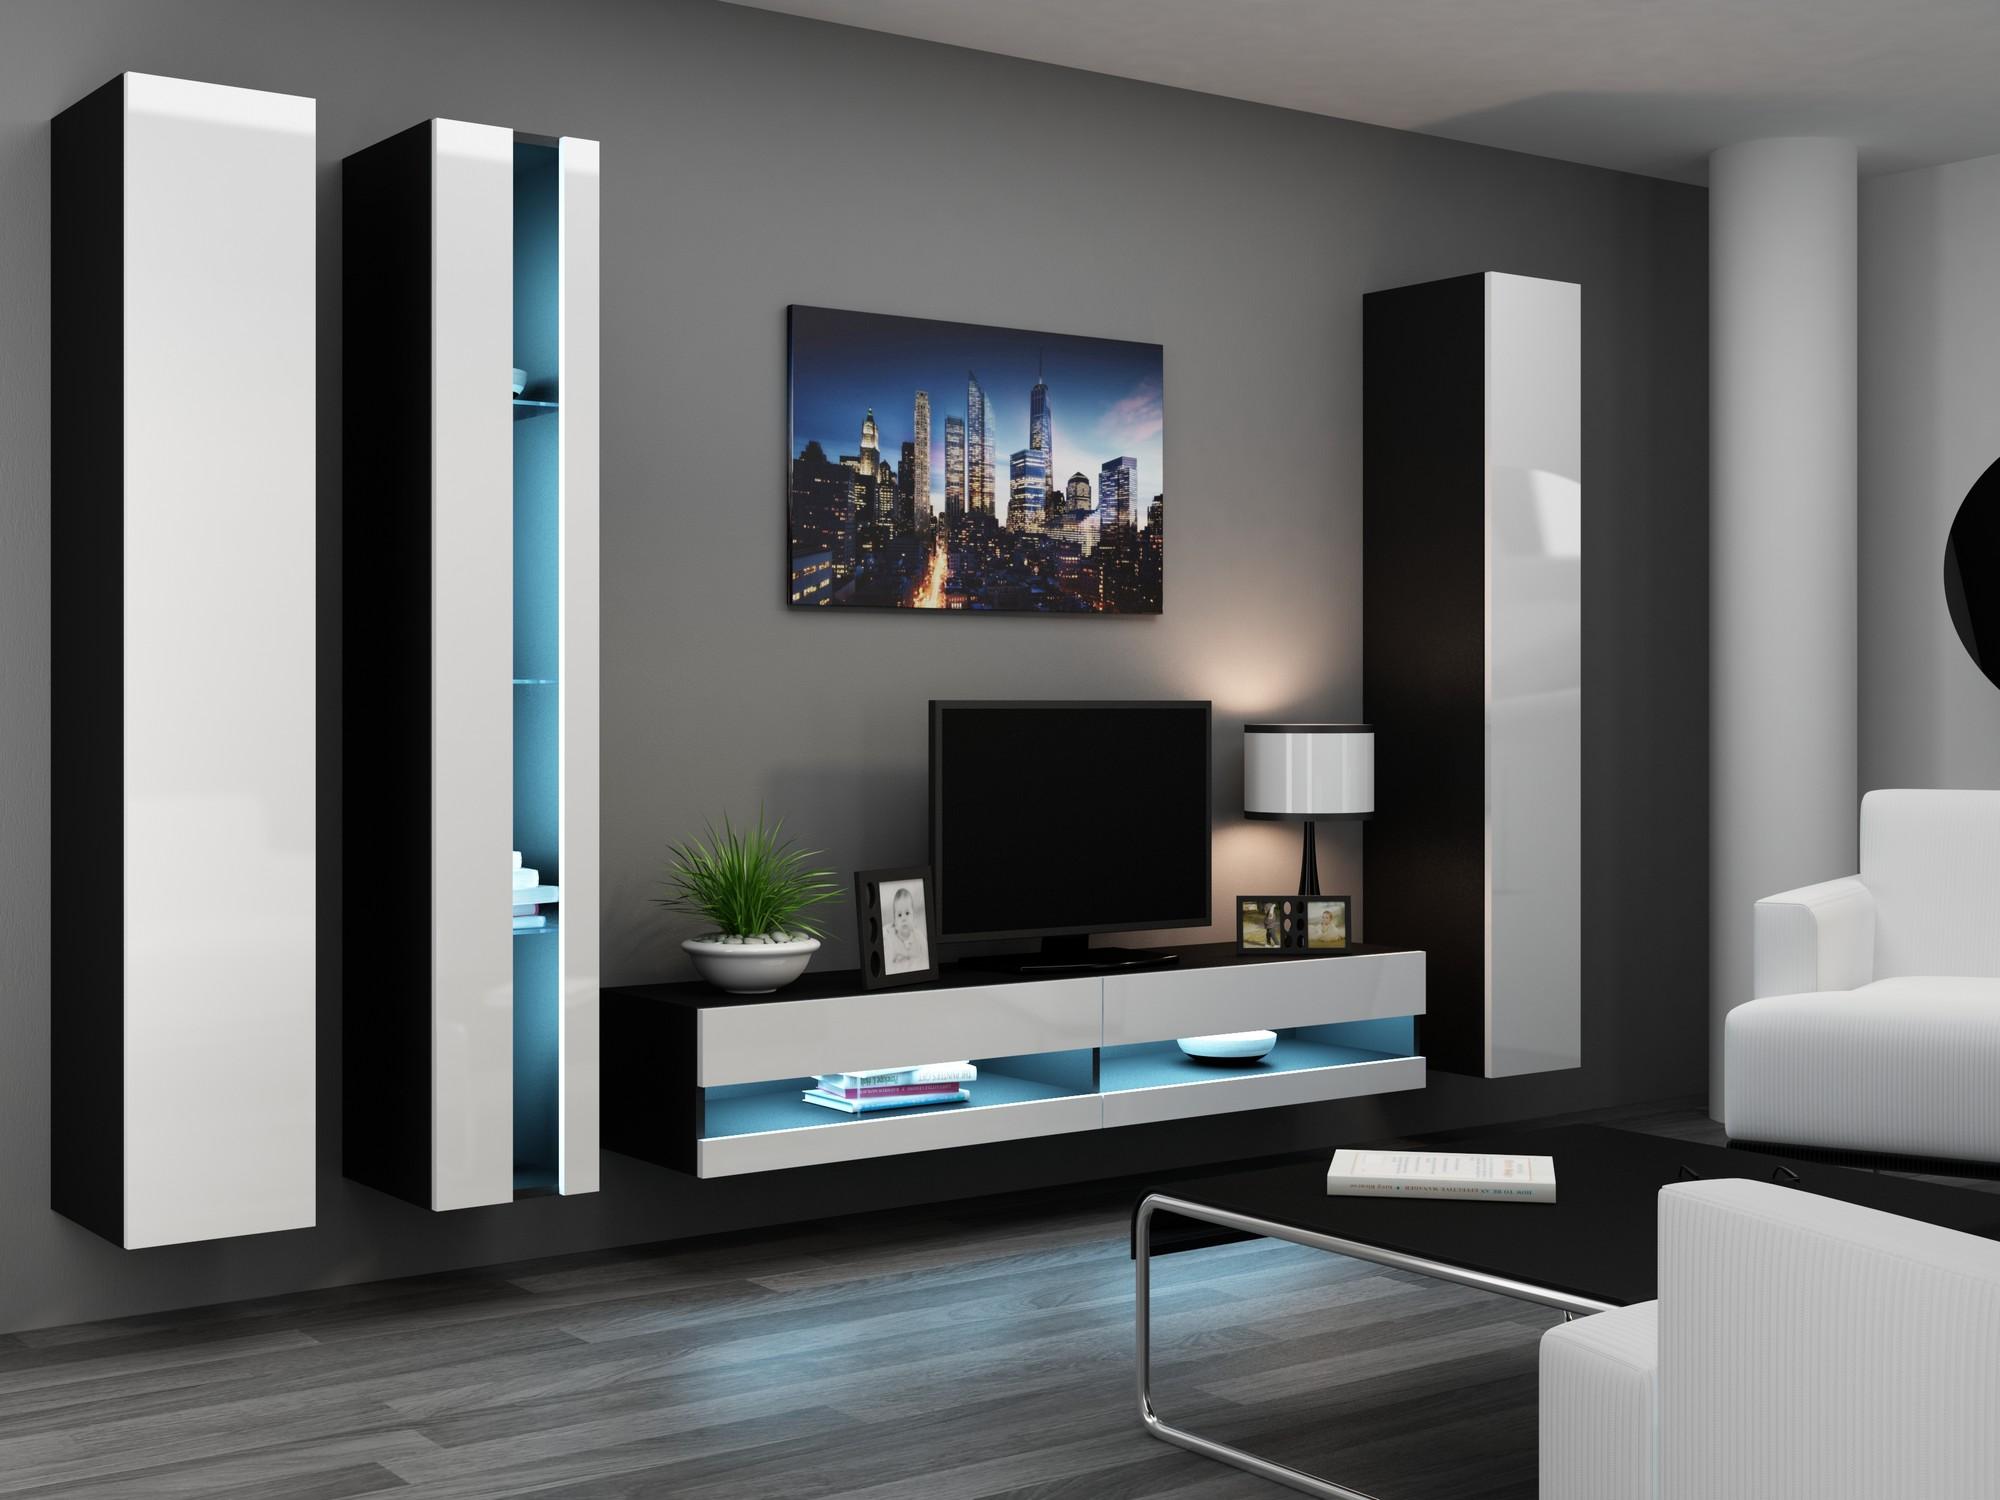 wohnwand anbauwand vigo in mdf hochglanz pusch click farbauswahl ebay. Black Bedroom Furniture Sets. Home Design Ideas